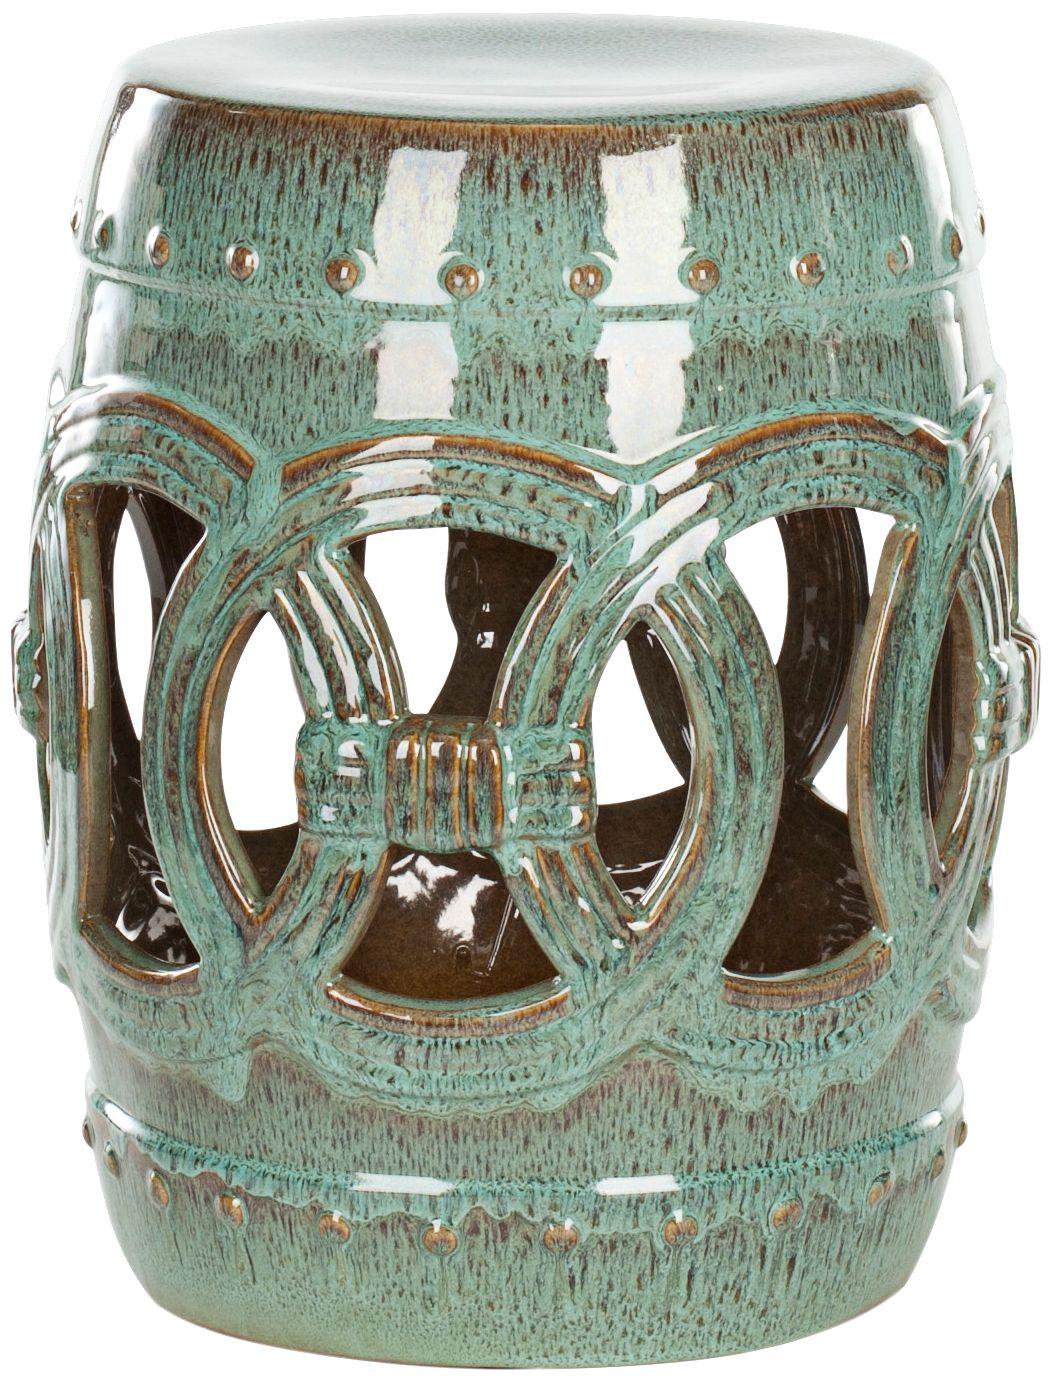 Safavieh Double Coin Blue-Green Ceramic Garden Stool  sc 1 st  L&s Plus & Garden Stools - Outdoor Decor | Lamps Plus islam-shia.org